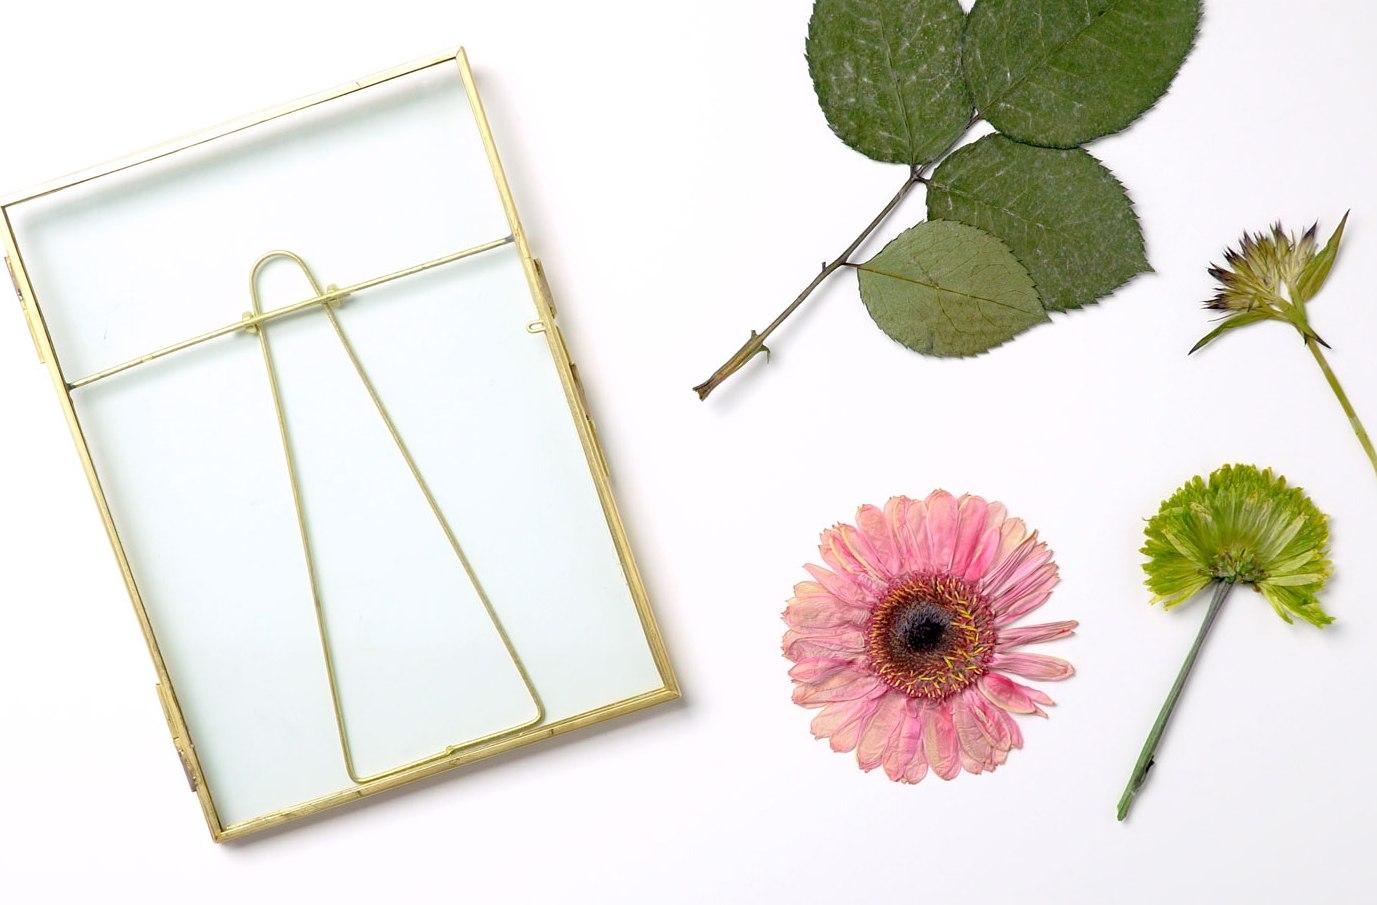 ftd-press-flowers-frame-step1.jpg